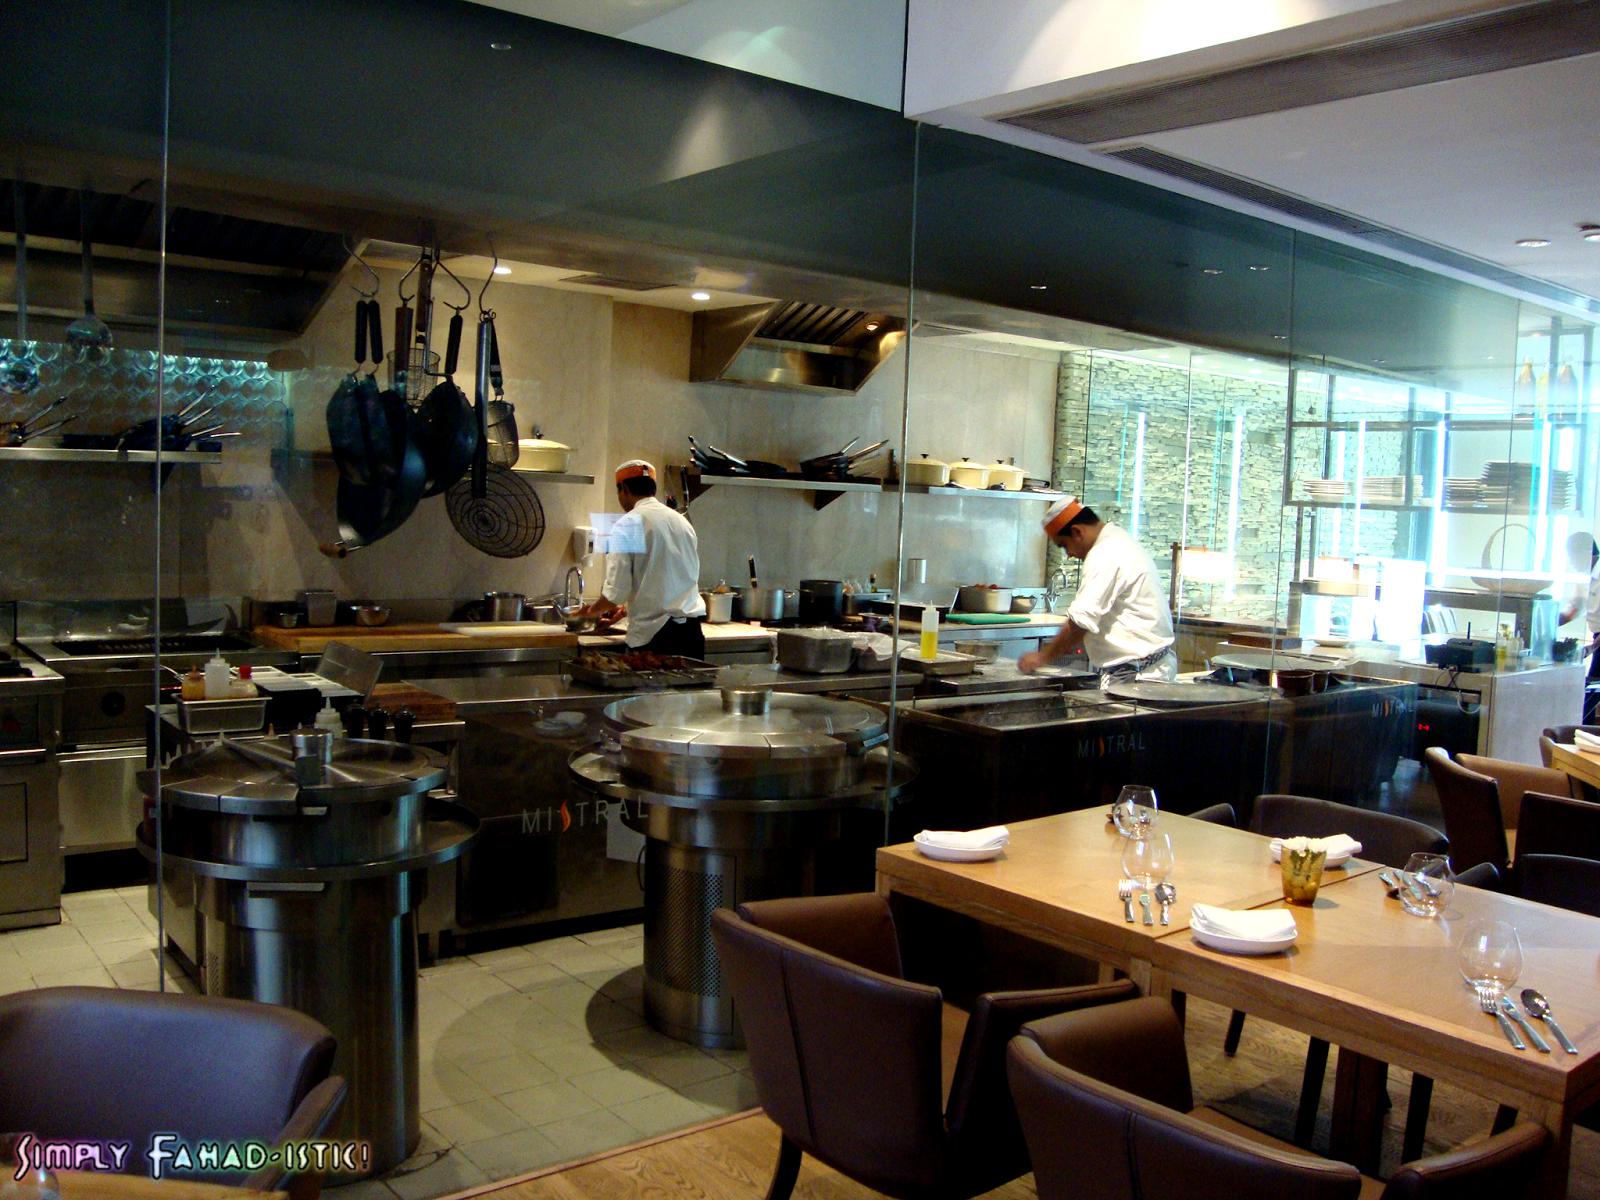 glass wall restaurant  Google Search  Deli and Demo  Glass restaurant Open kitchen